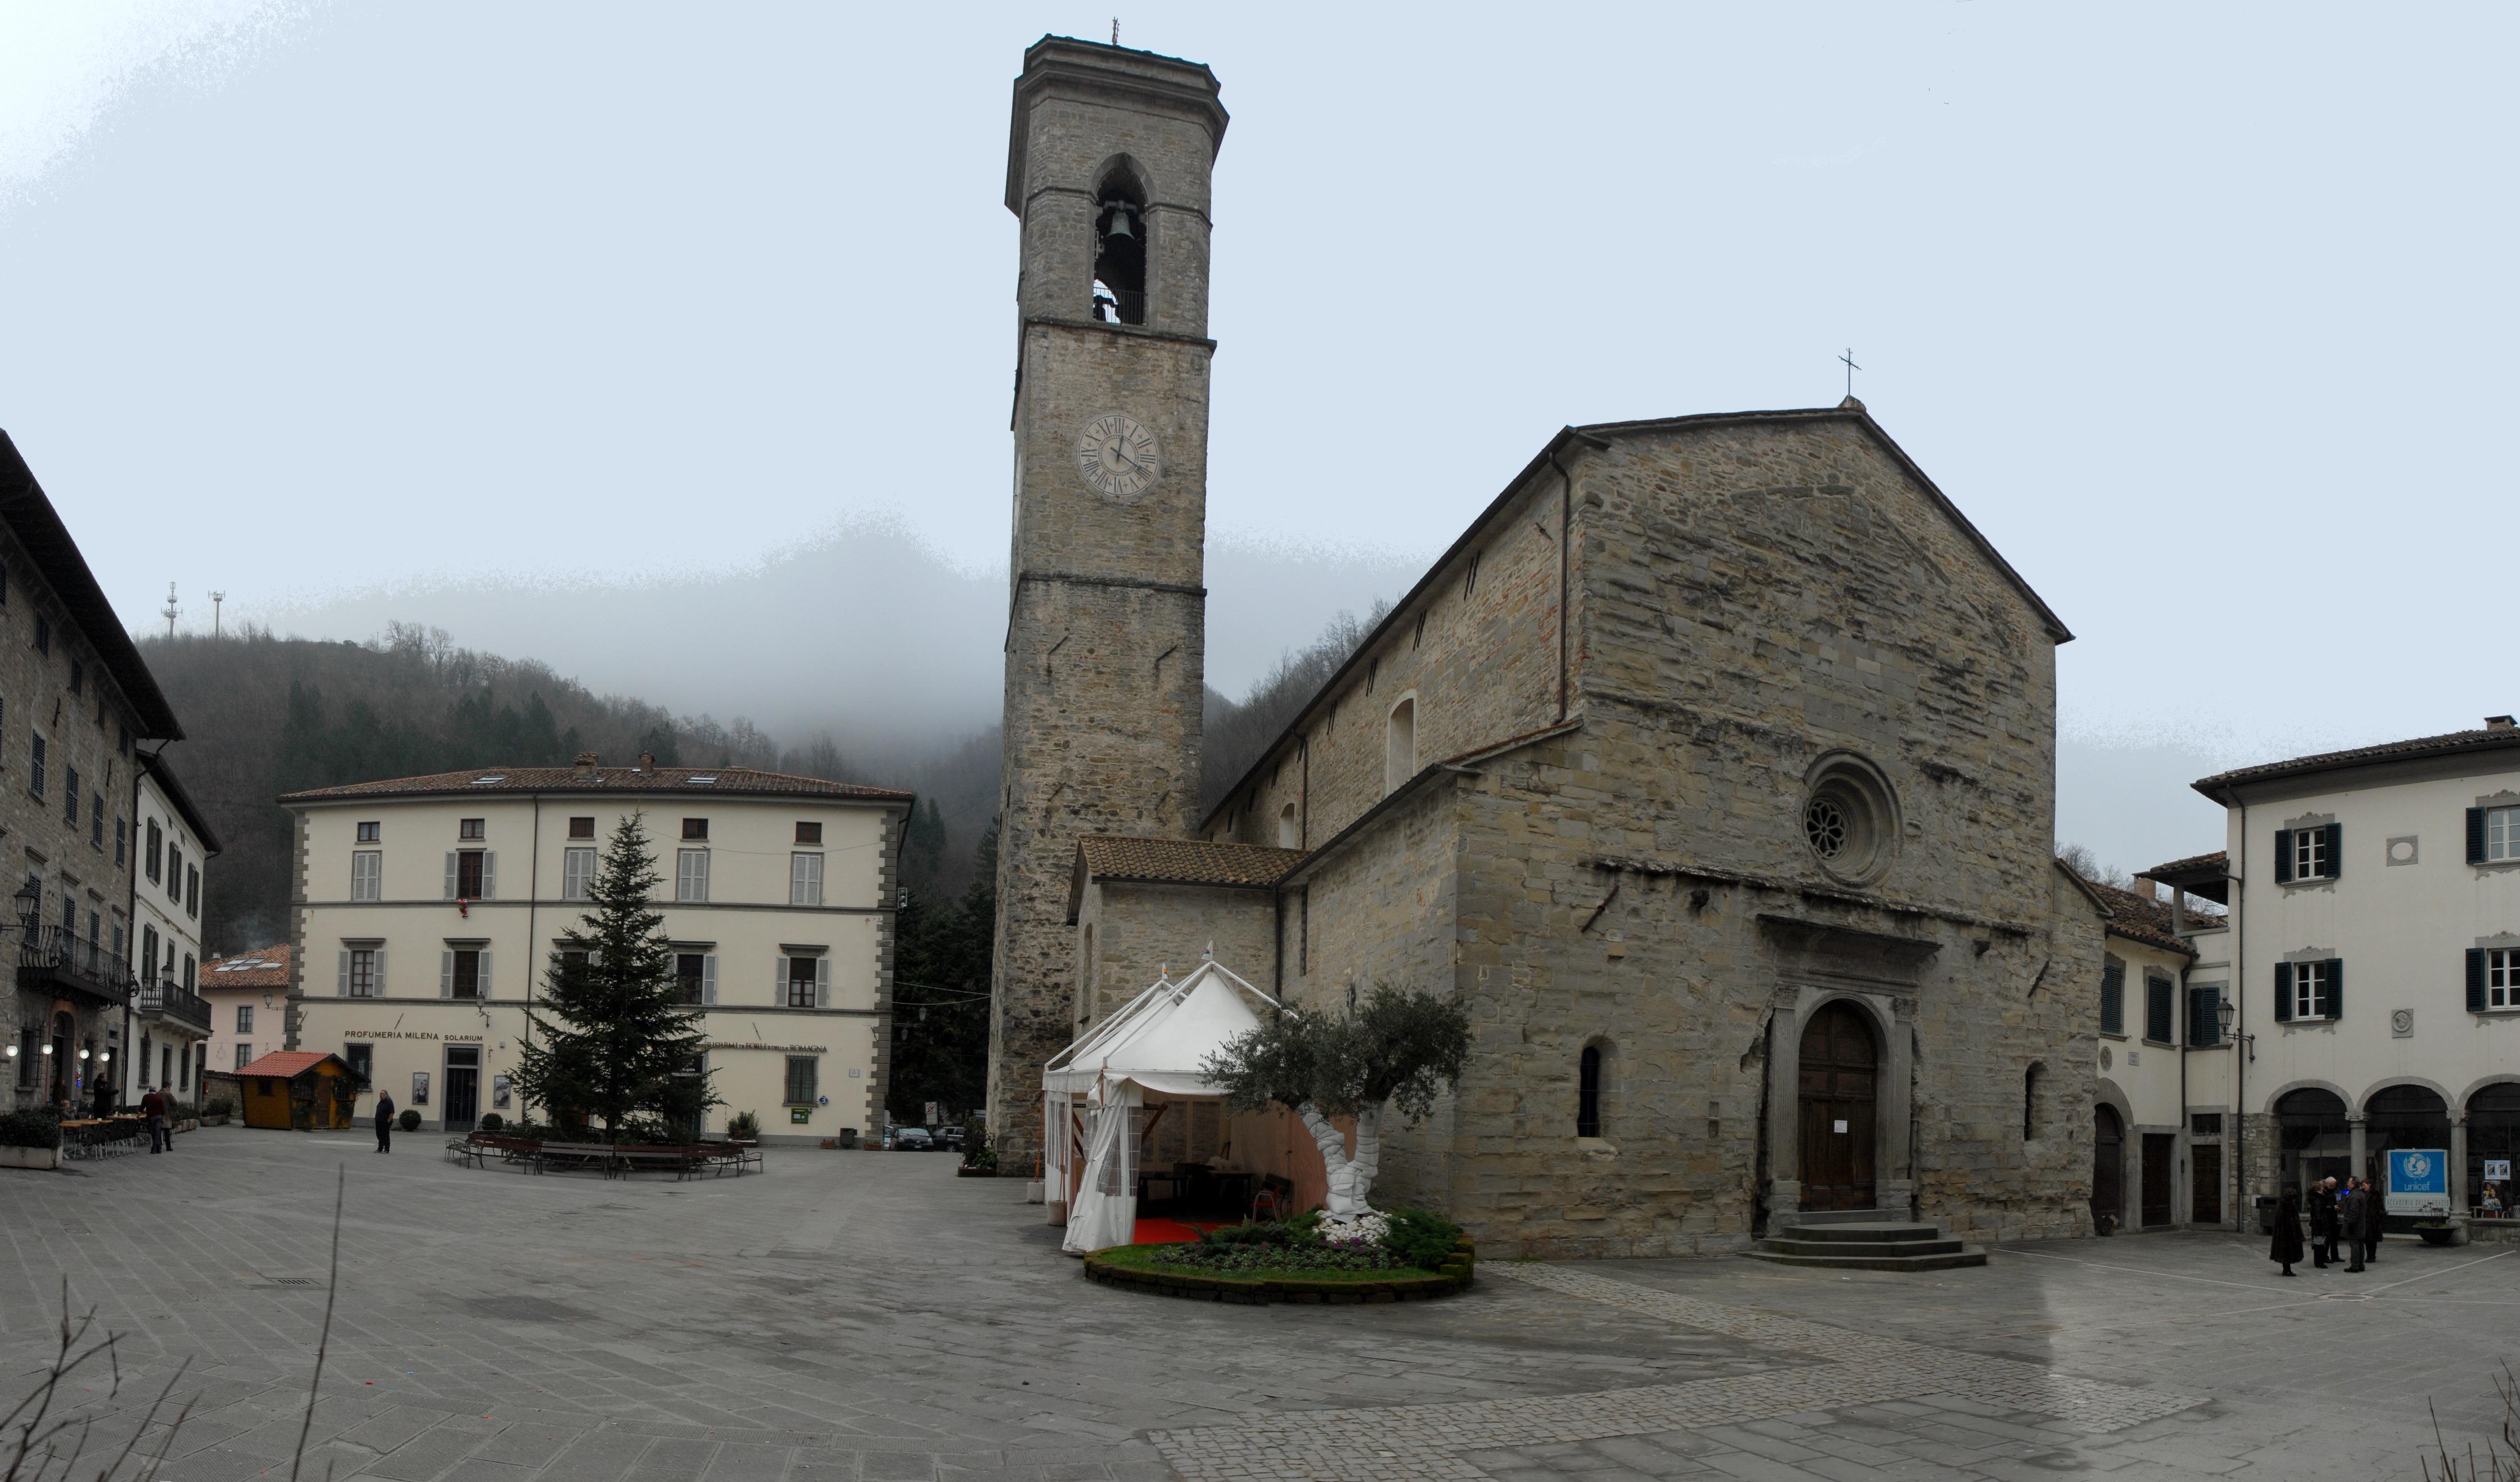 https://upload.wikimedia.org/wikipedia/commons/1/1f/Piazza_Ricasoli_e_Santa_Maria_Assunta_%28Bagno_di_Romagna%29.jpg